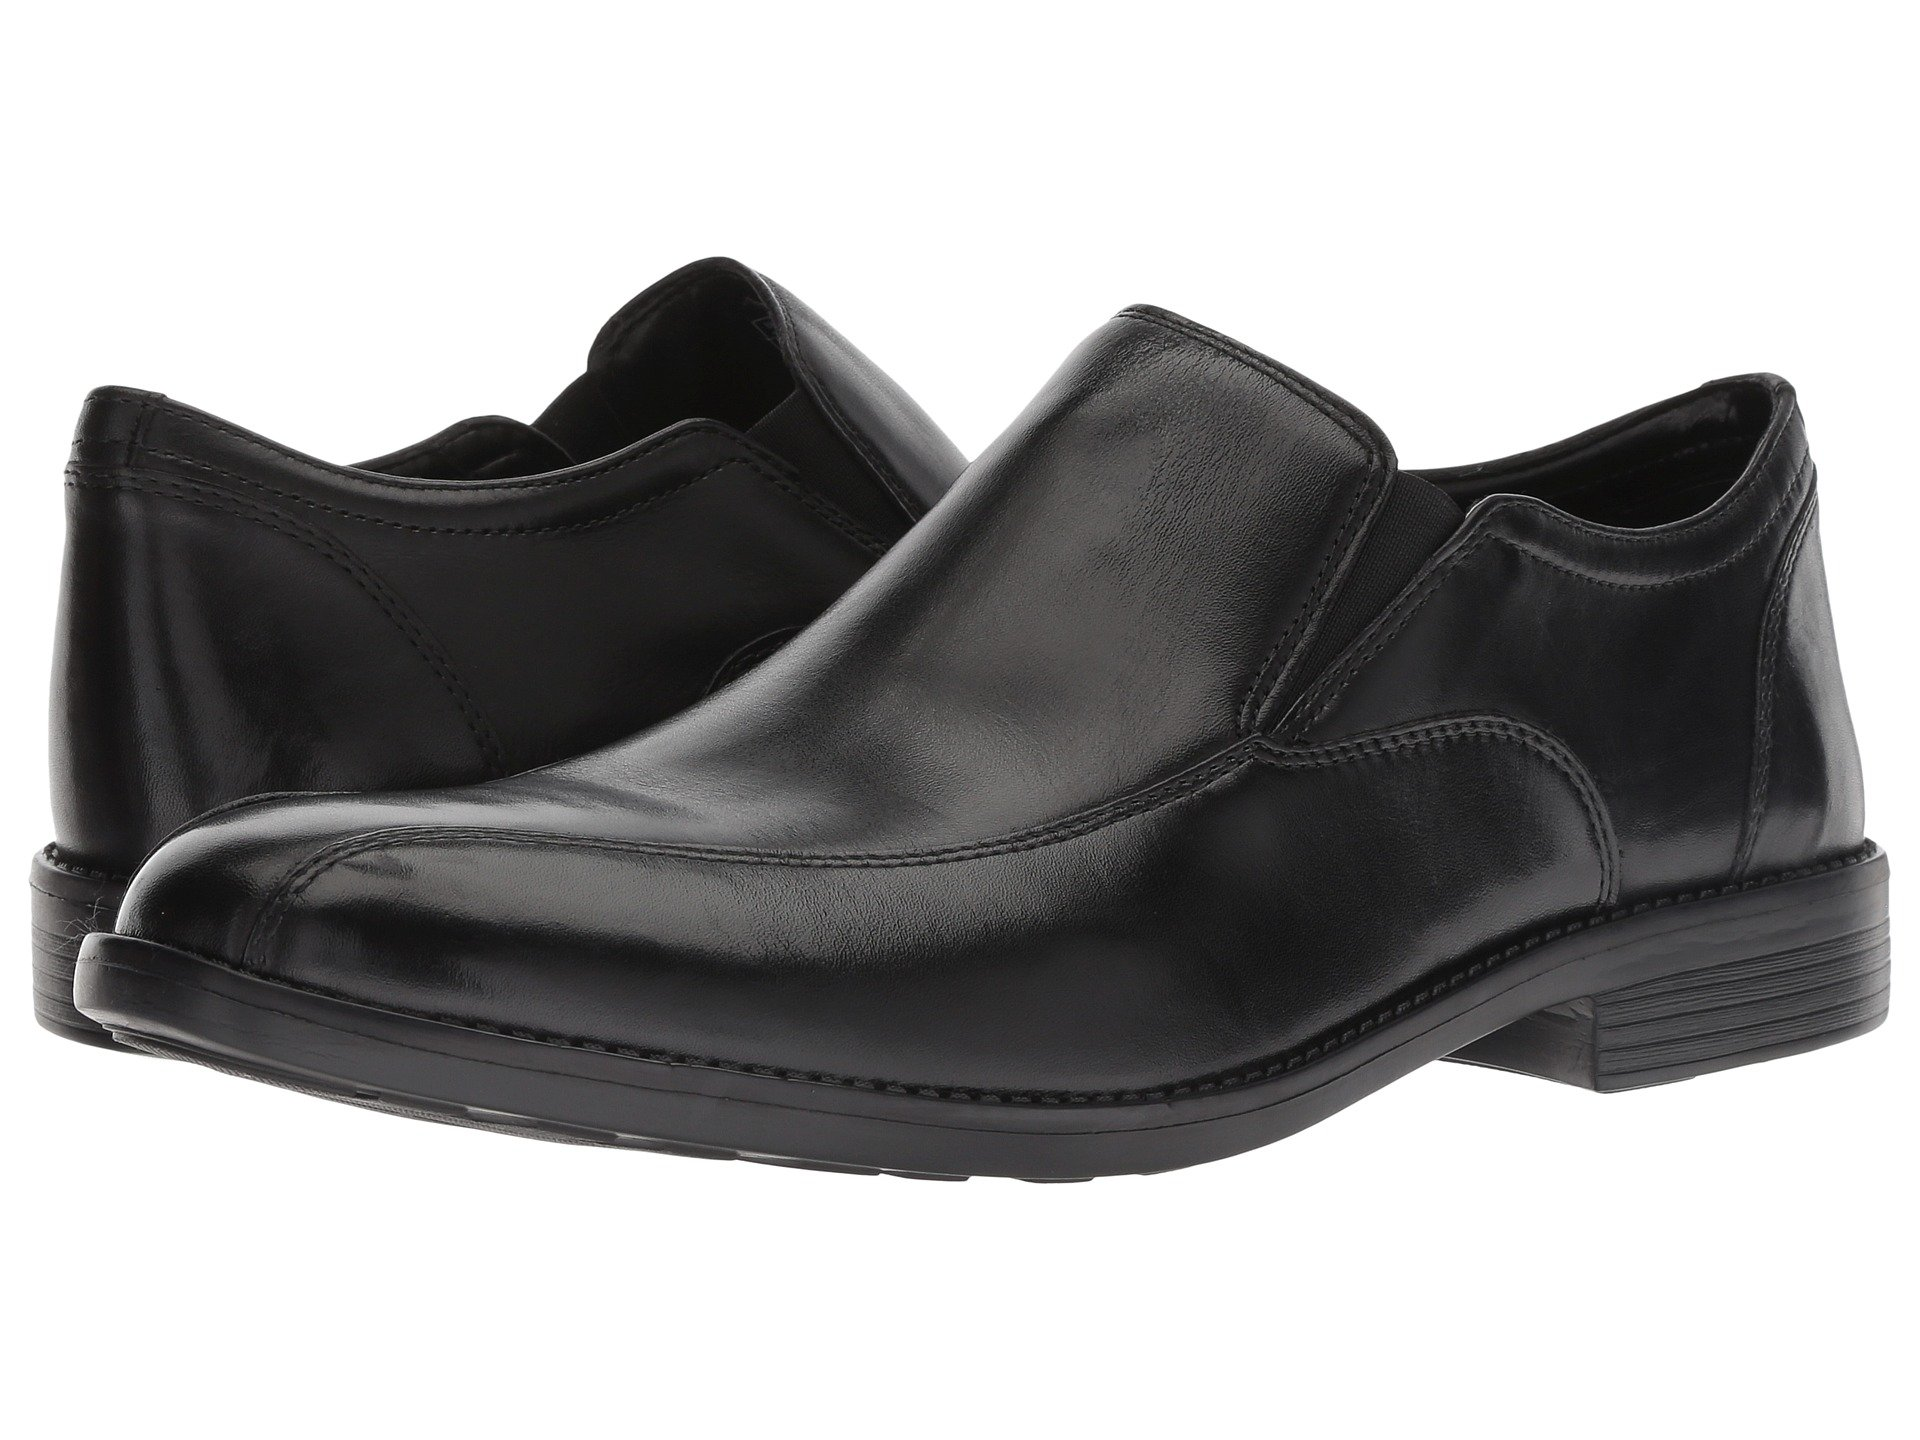 Step Birkett Birkett Bostonian Step Leather Leather Bostonian Black Black HqzAgwz